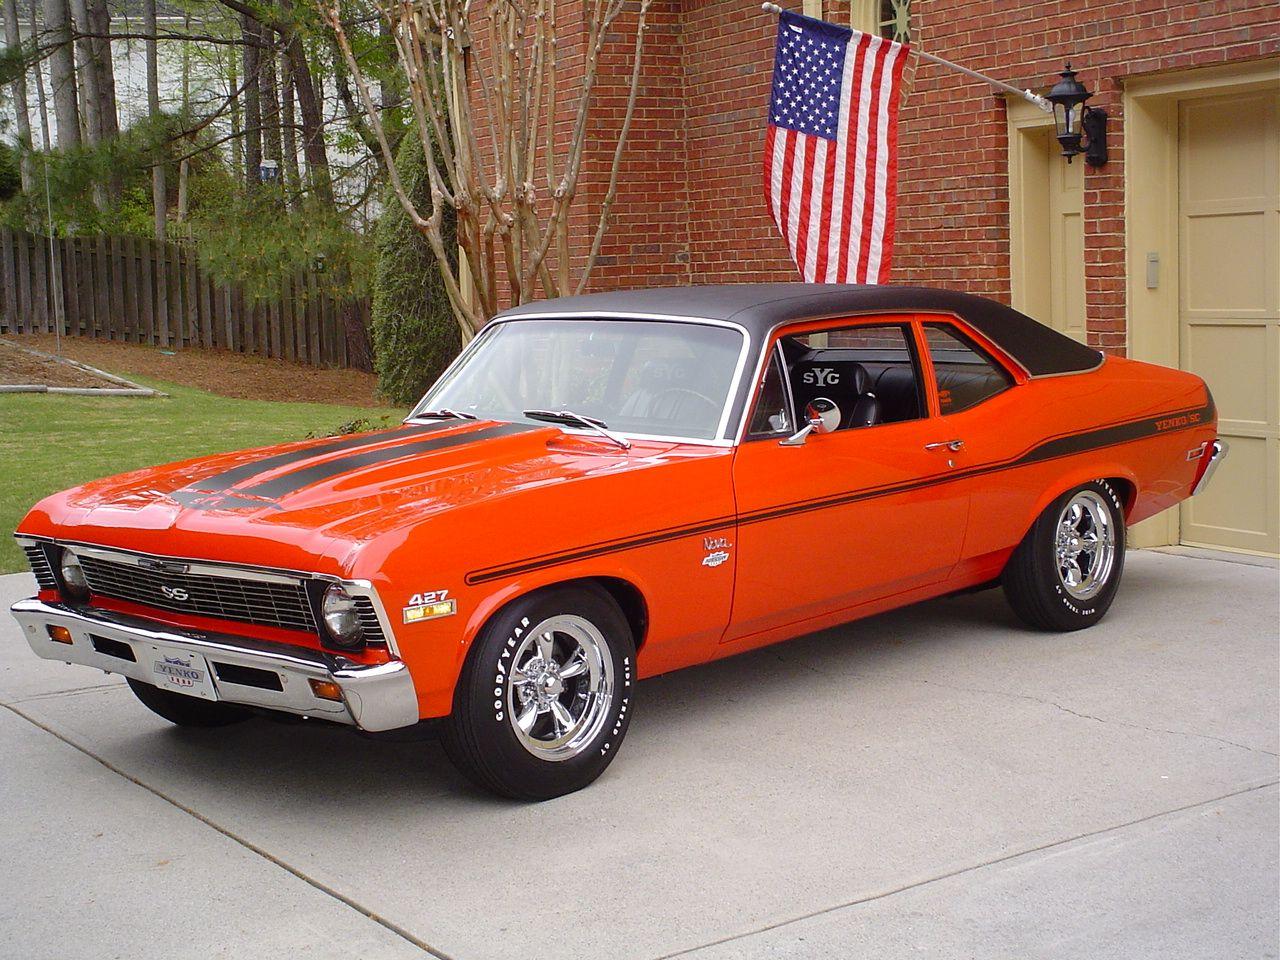 1969 Chevrolet Nova Yenko (or clone) Burnt Orange is nice ...